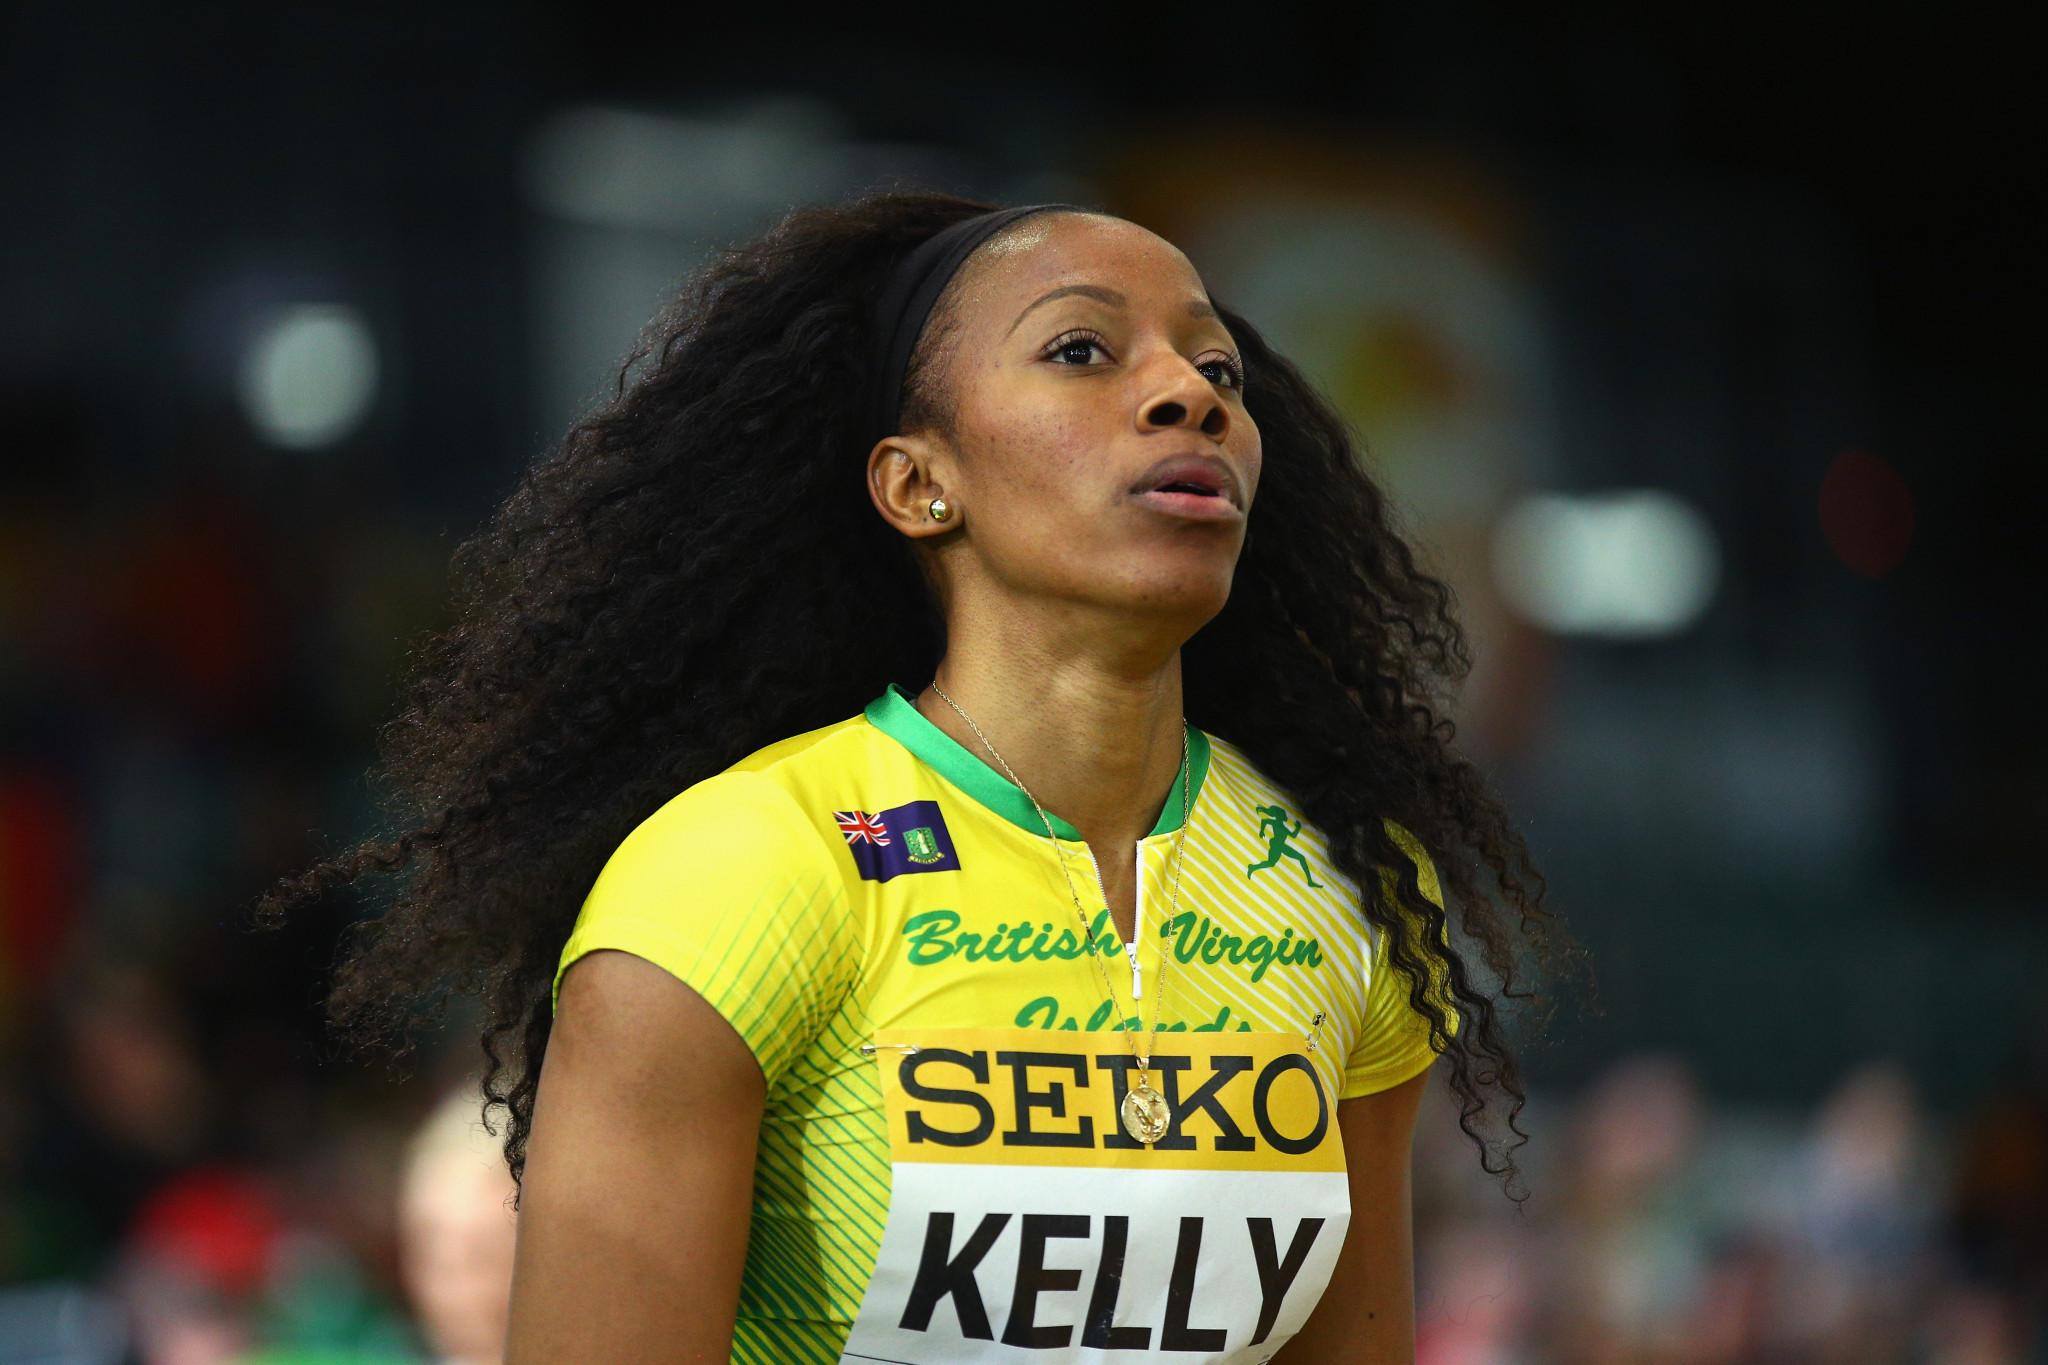 British Virgin Islands to send ten athletes to Gold Coast 2018